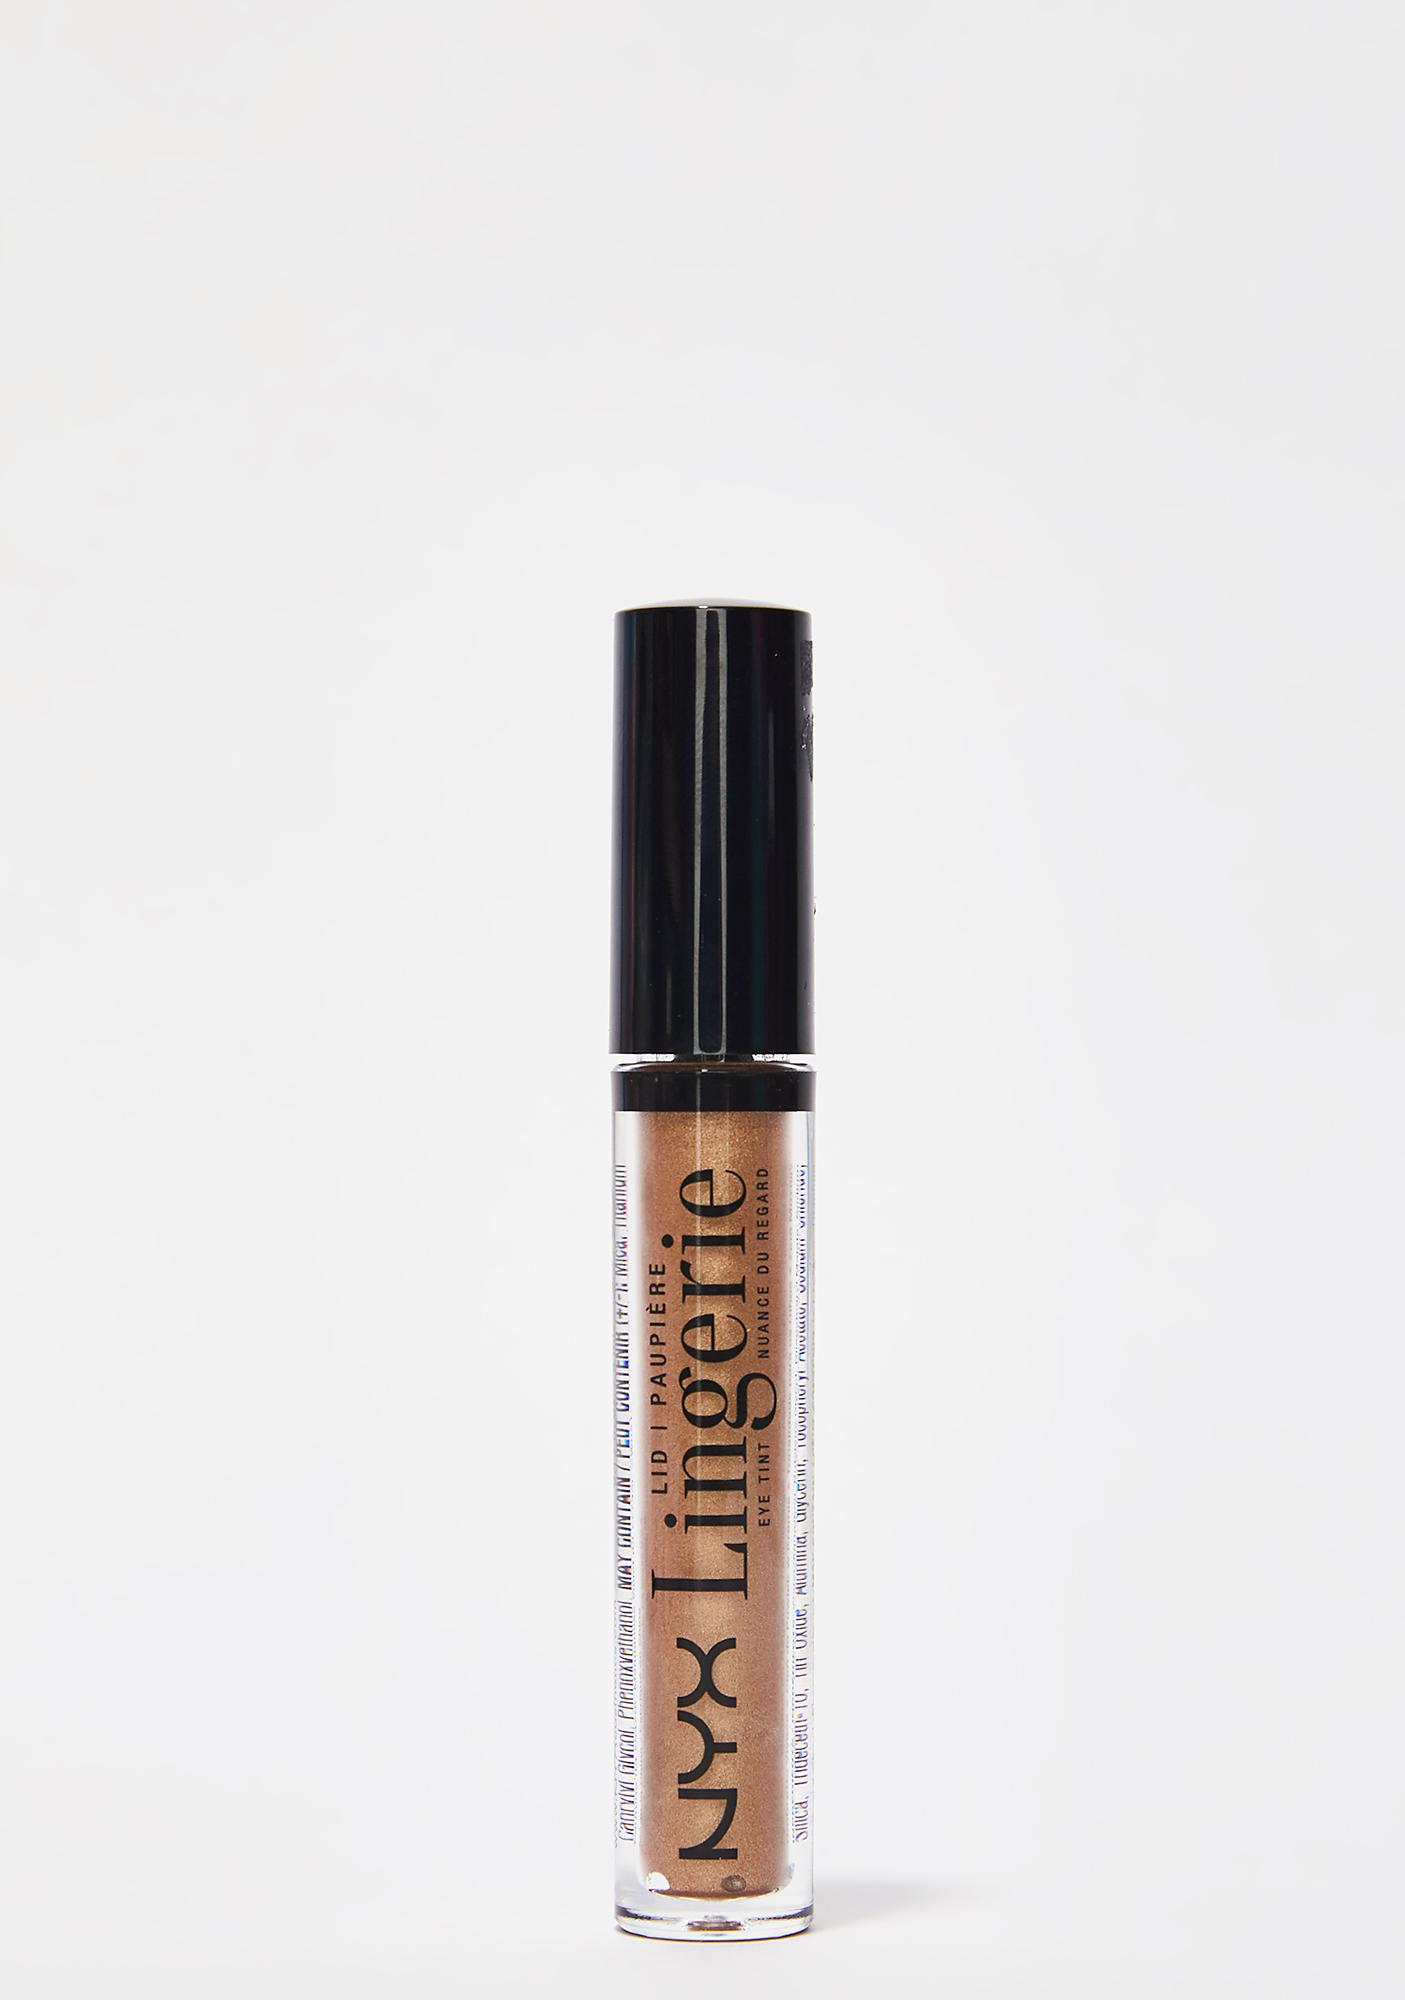 NYX Bronze Mirage Lid Lingerie Eye Tint